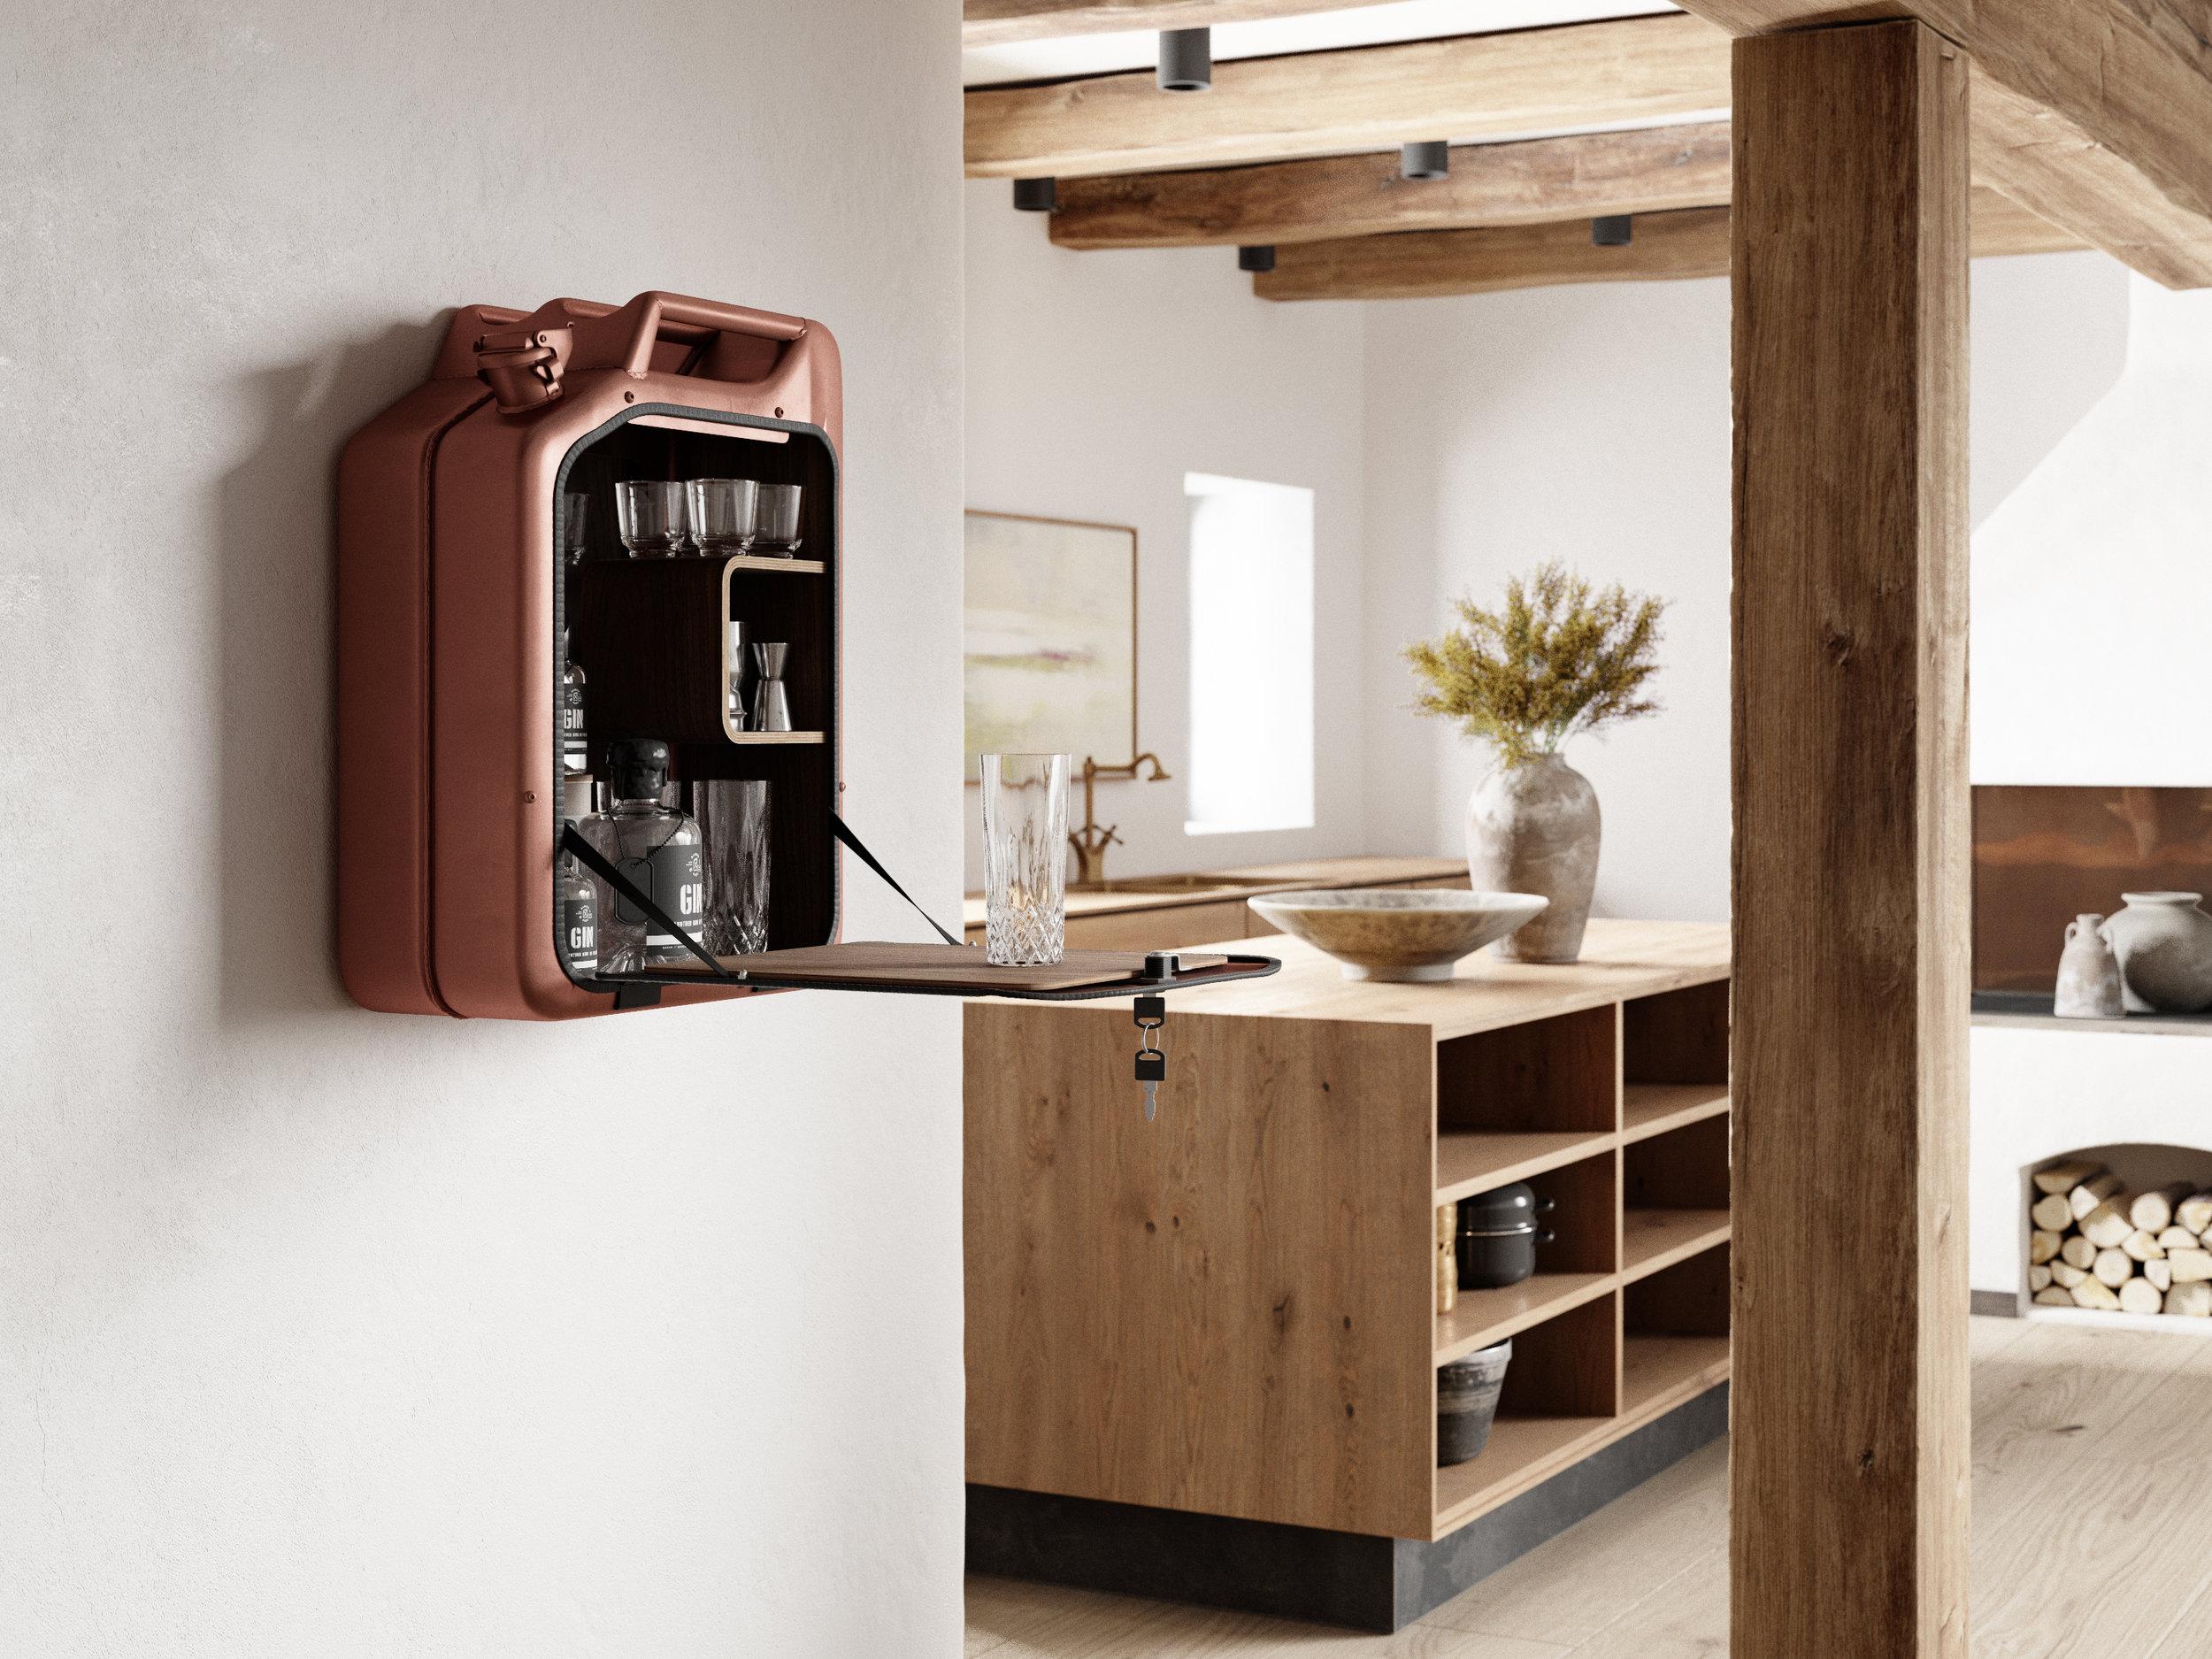 CADABBRA.COM.AU_#39_Top3_By_Design_Danish_Fuel_Copper_9.jpg